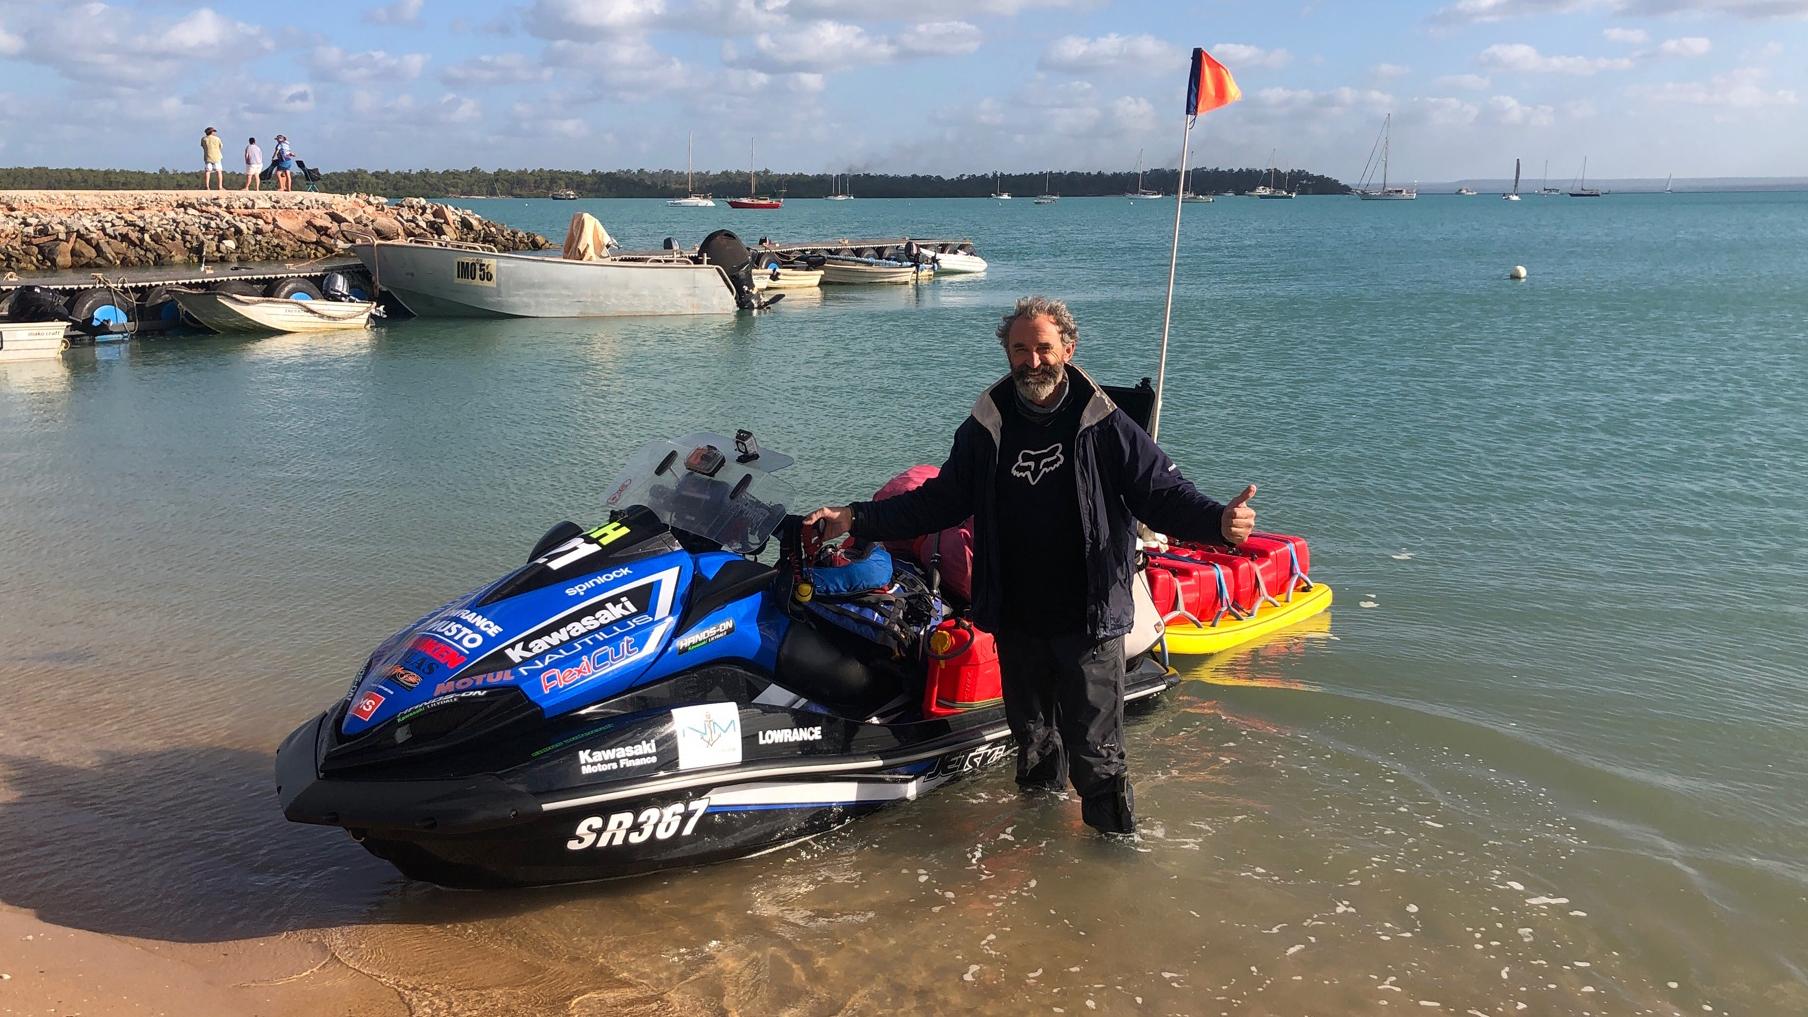 Jet Ski around Australia arrives in Darwin, finish line just weeks away